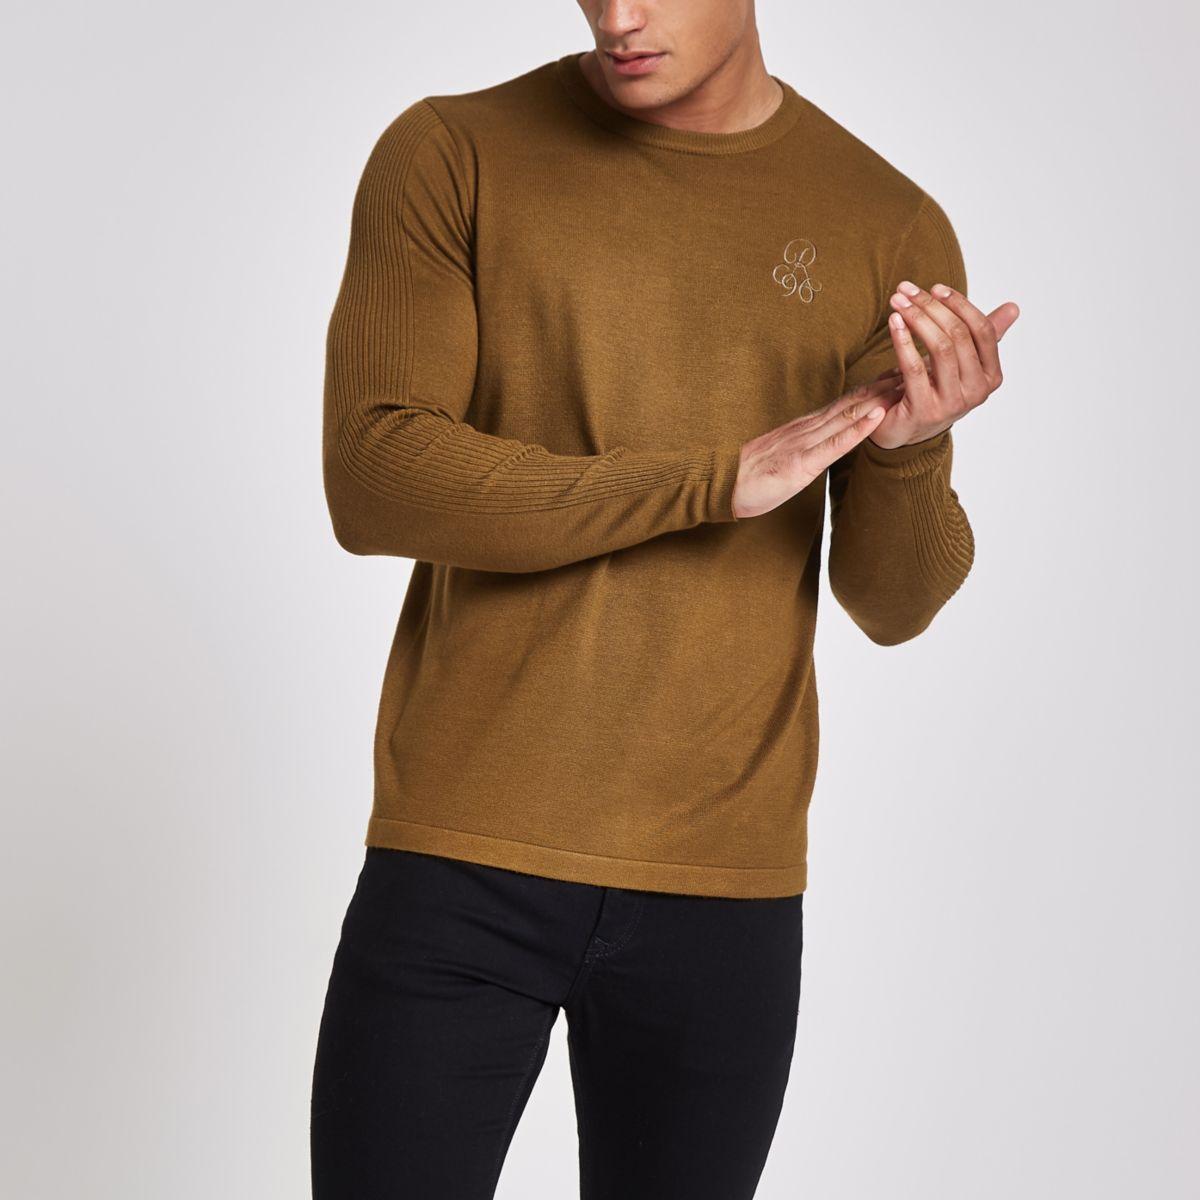 Green 'R96' slim fit crew neck sweater